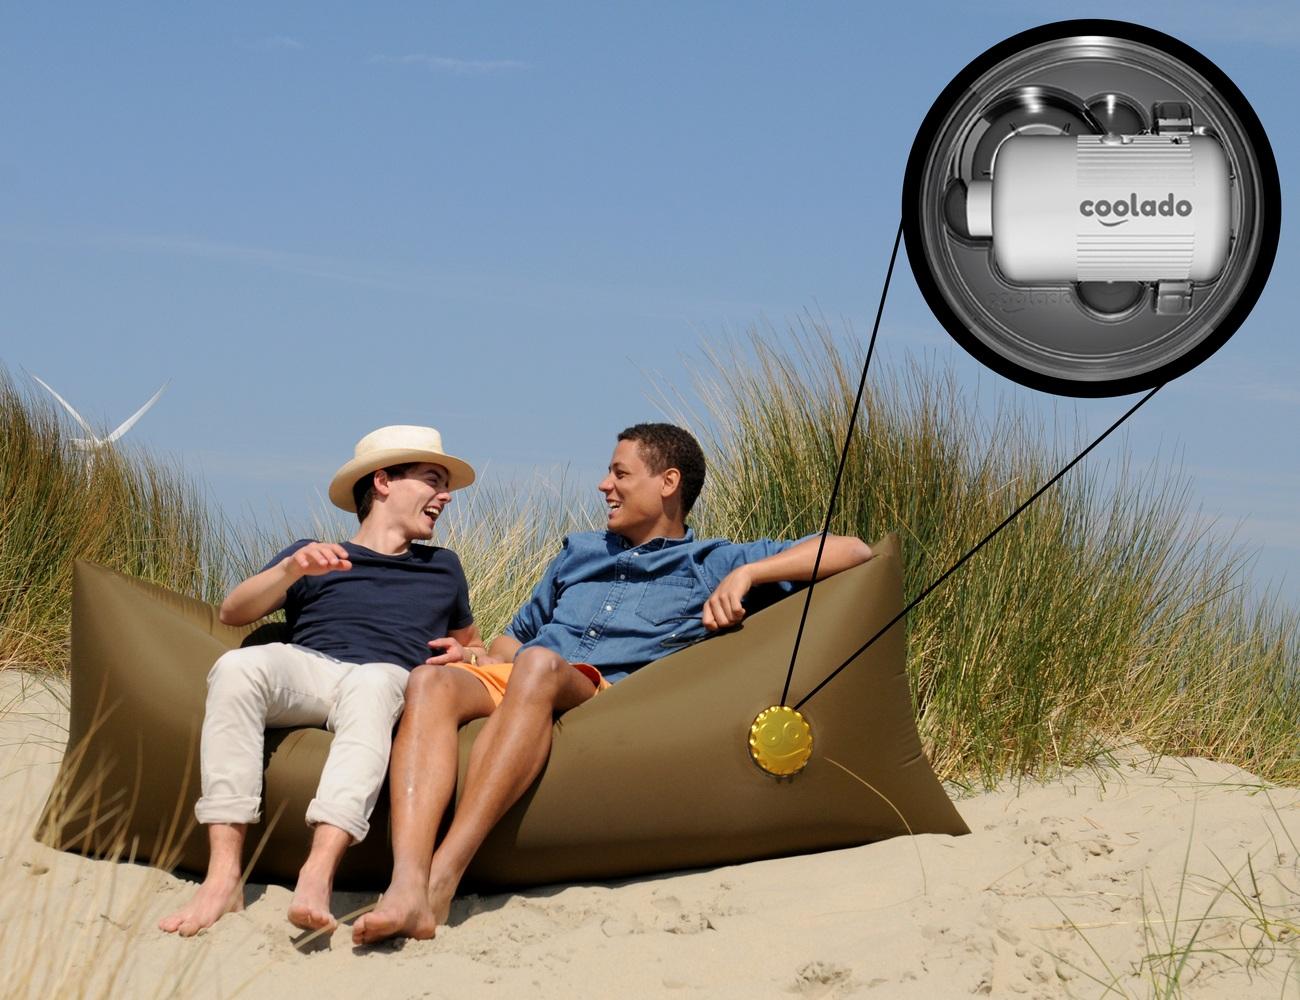 Coolado – Self-Inflating Loungebag with Built-In AirPump